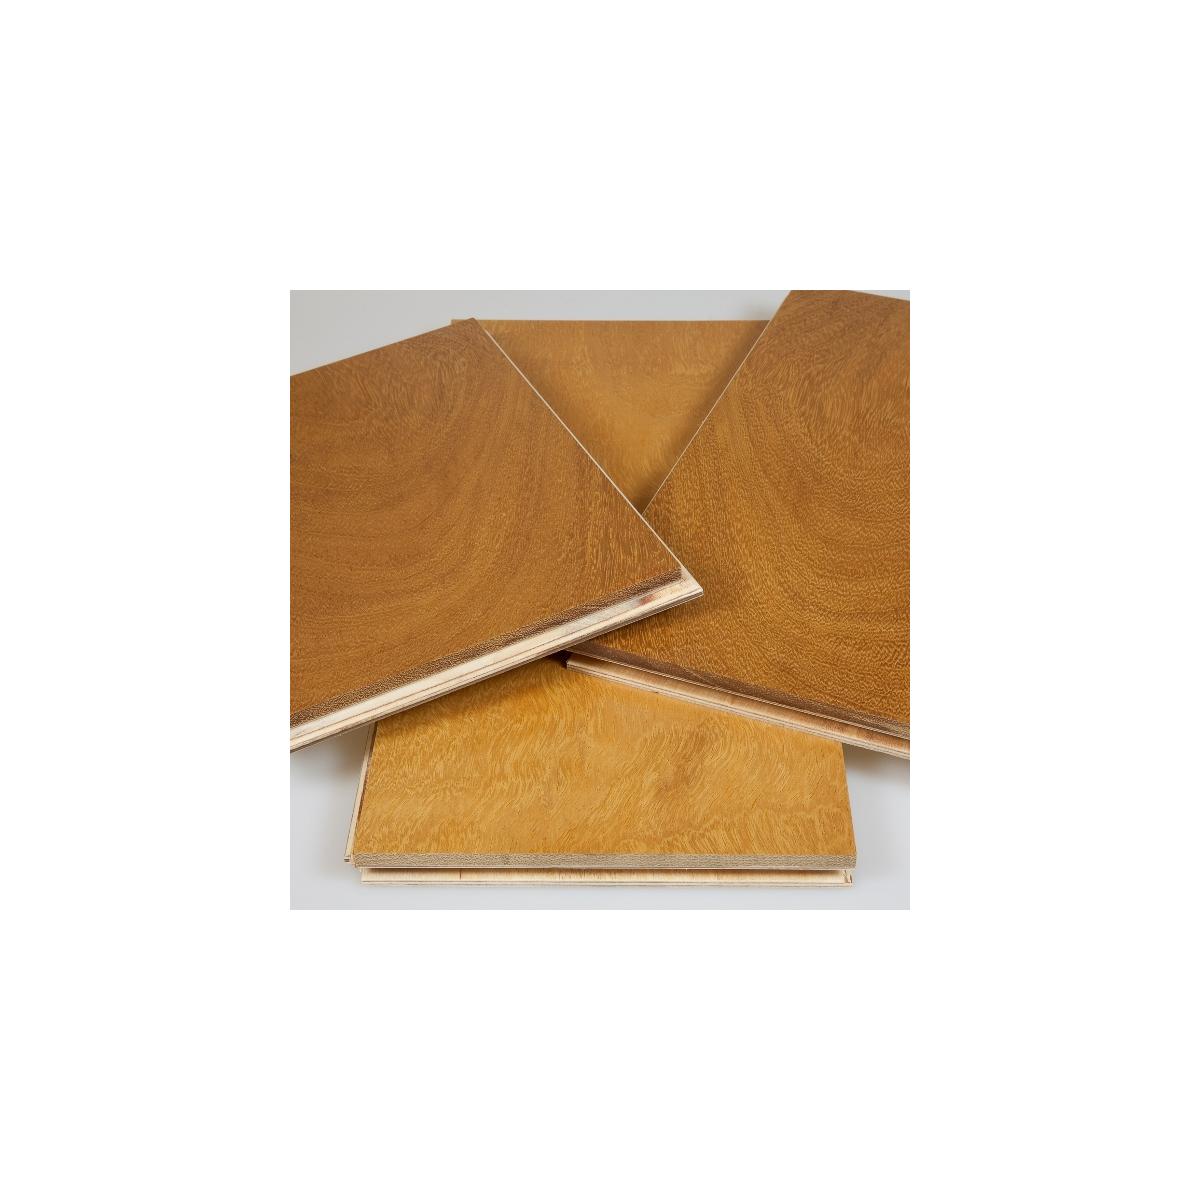 Vente parquet iroko contrecoll huil 16x140 qualit premium - Collection exclusive bois ...